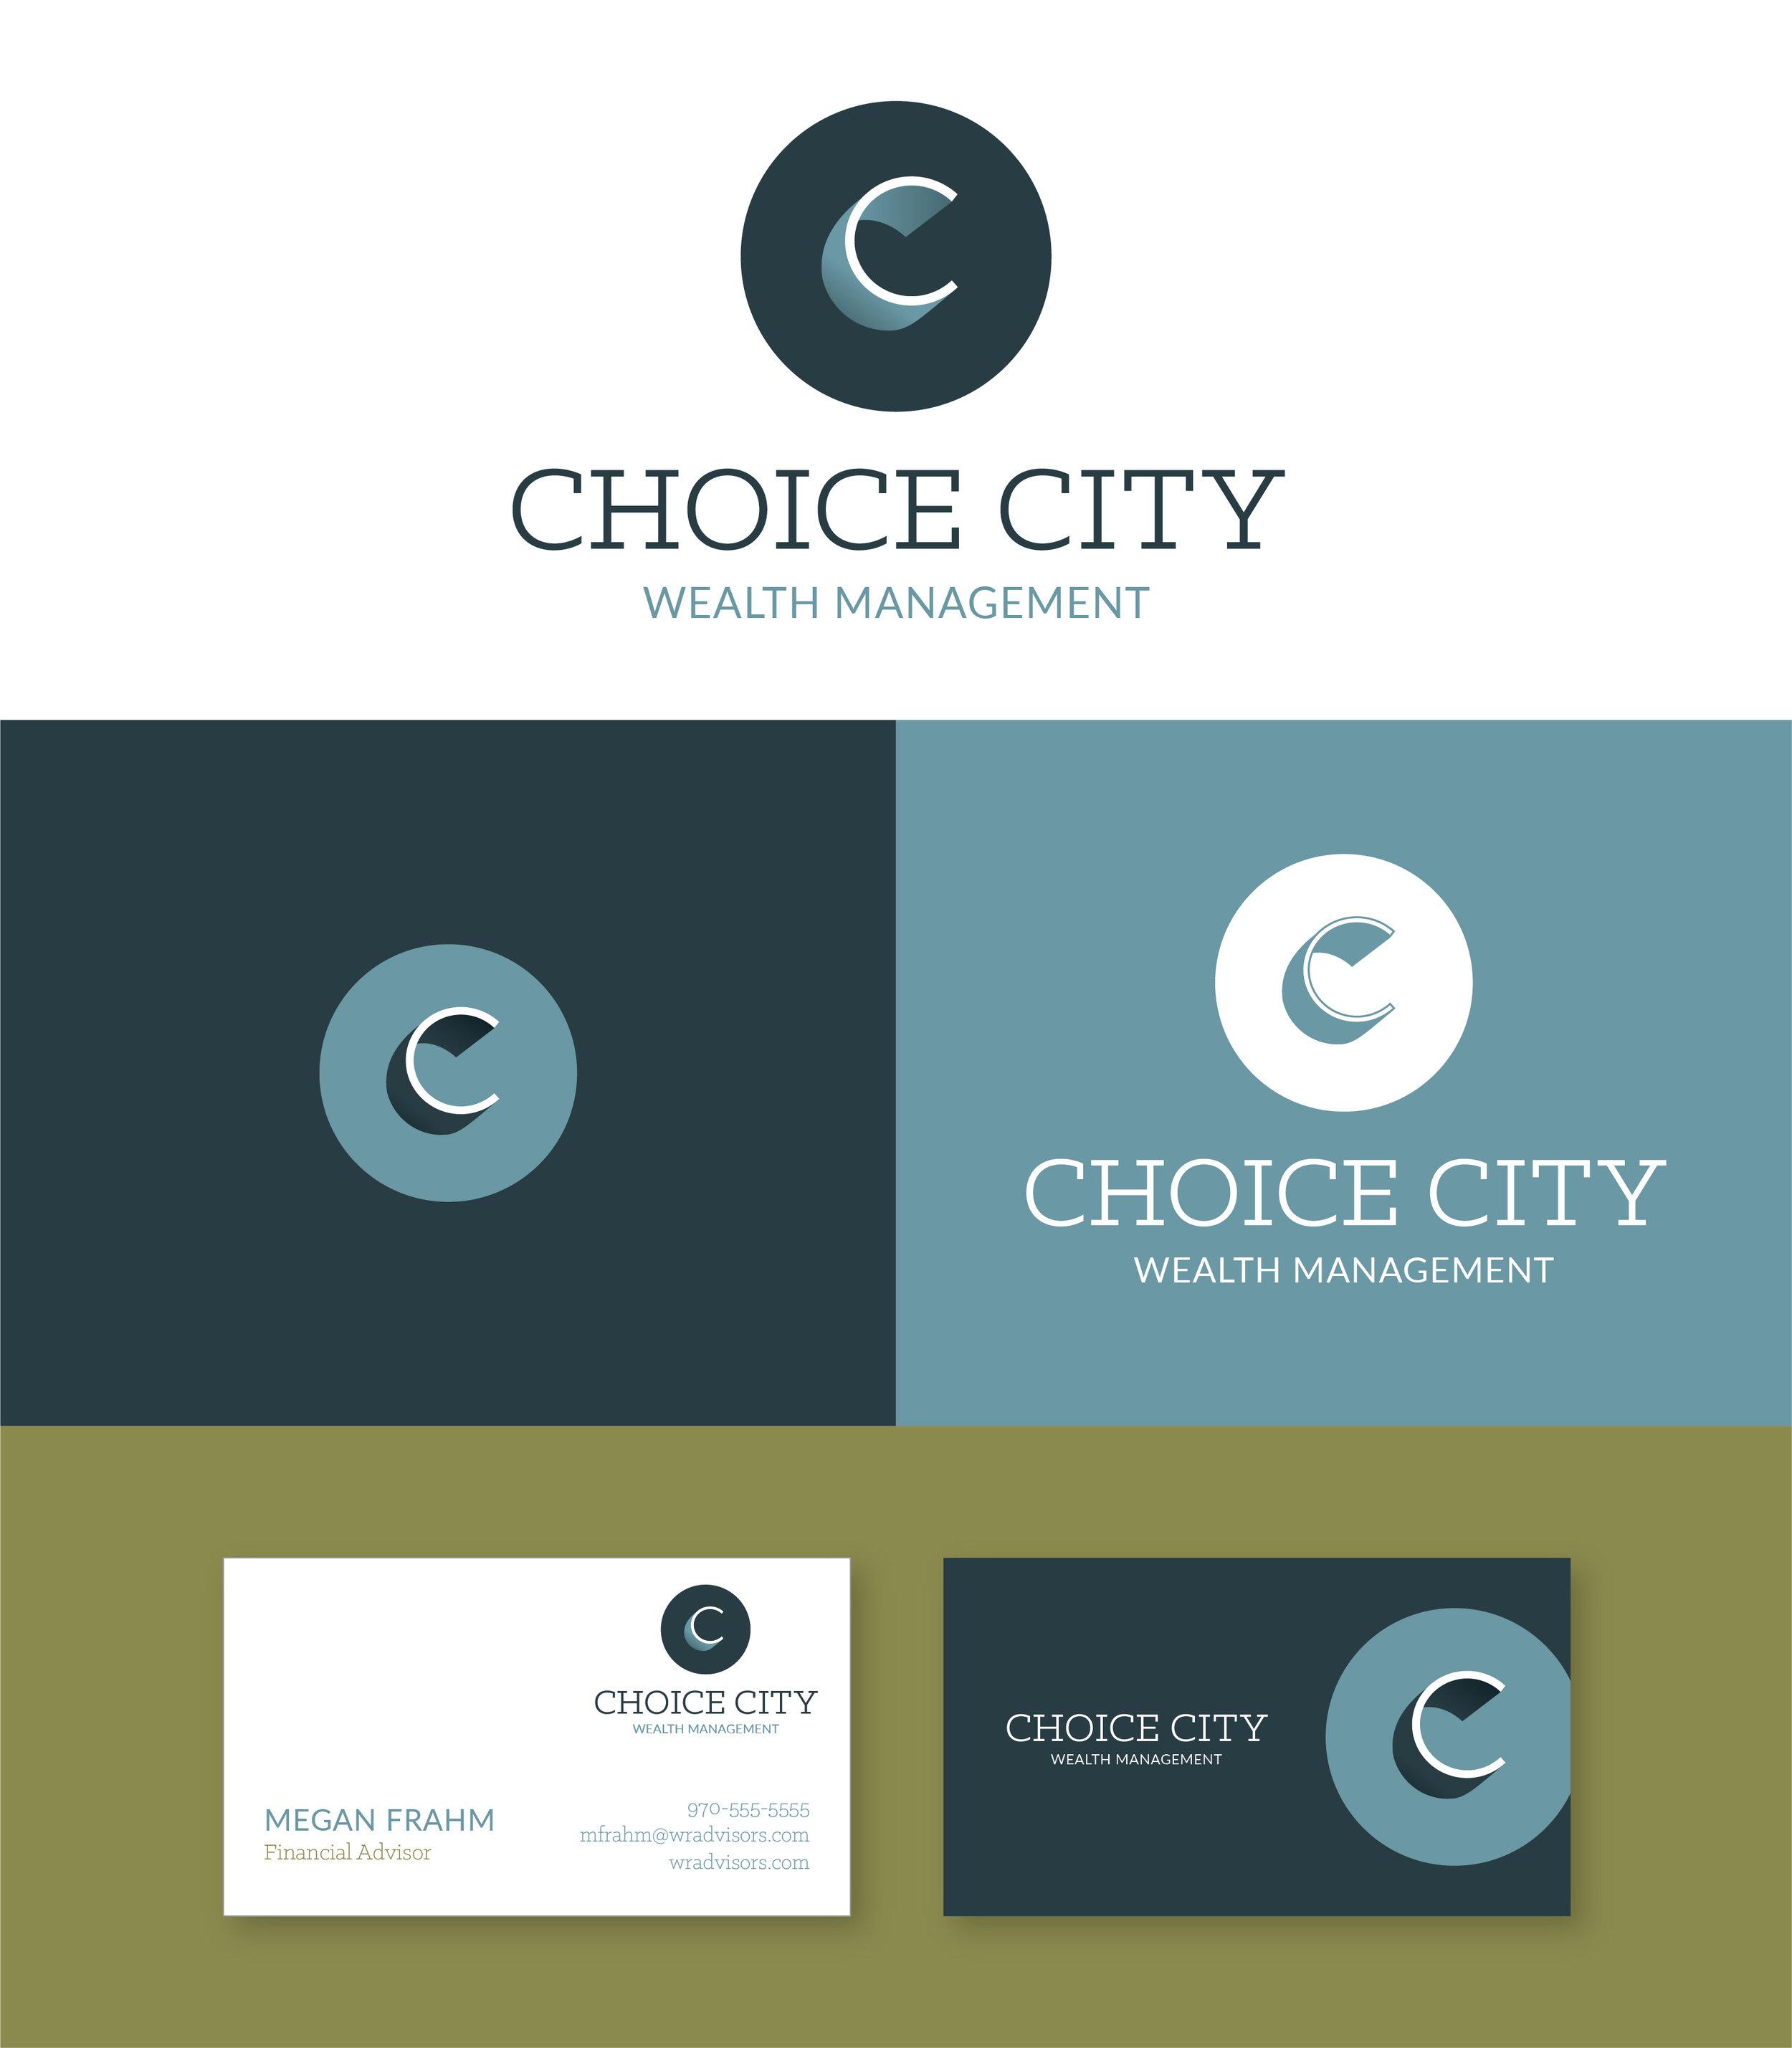 ChoiceCIty_FirstLook-03.jpg